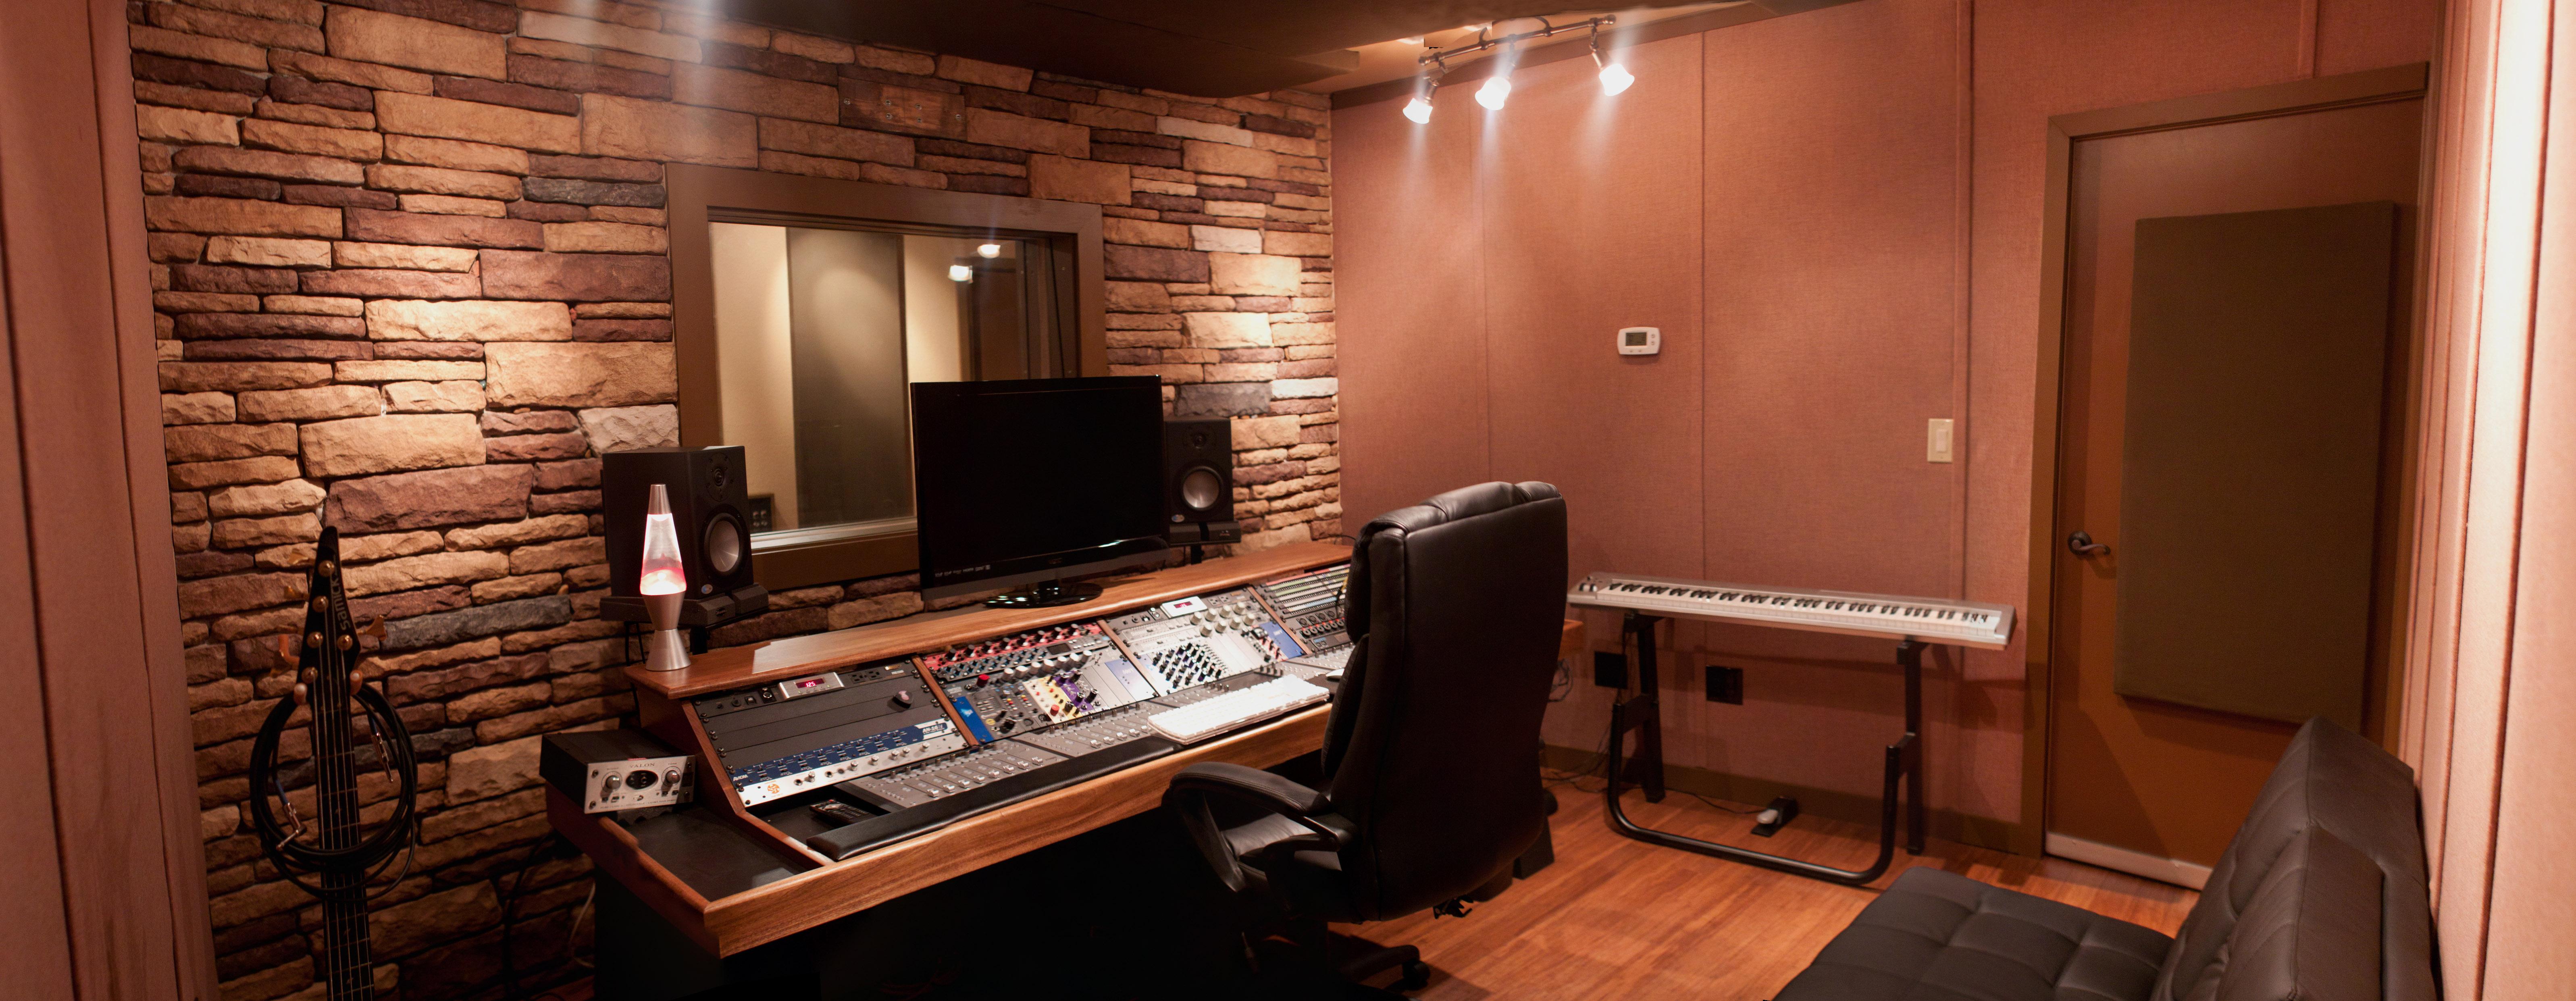 Blue sky blog archive stonewall studio suburban for Garage with studio